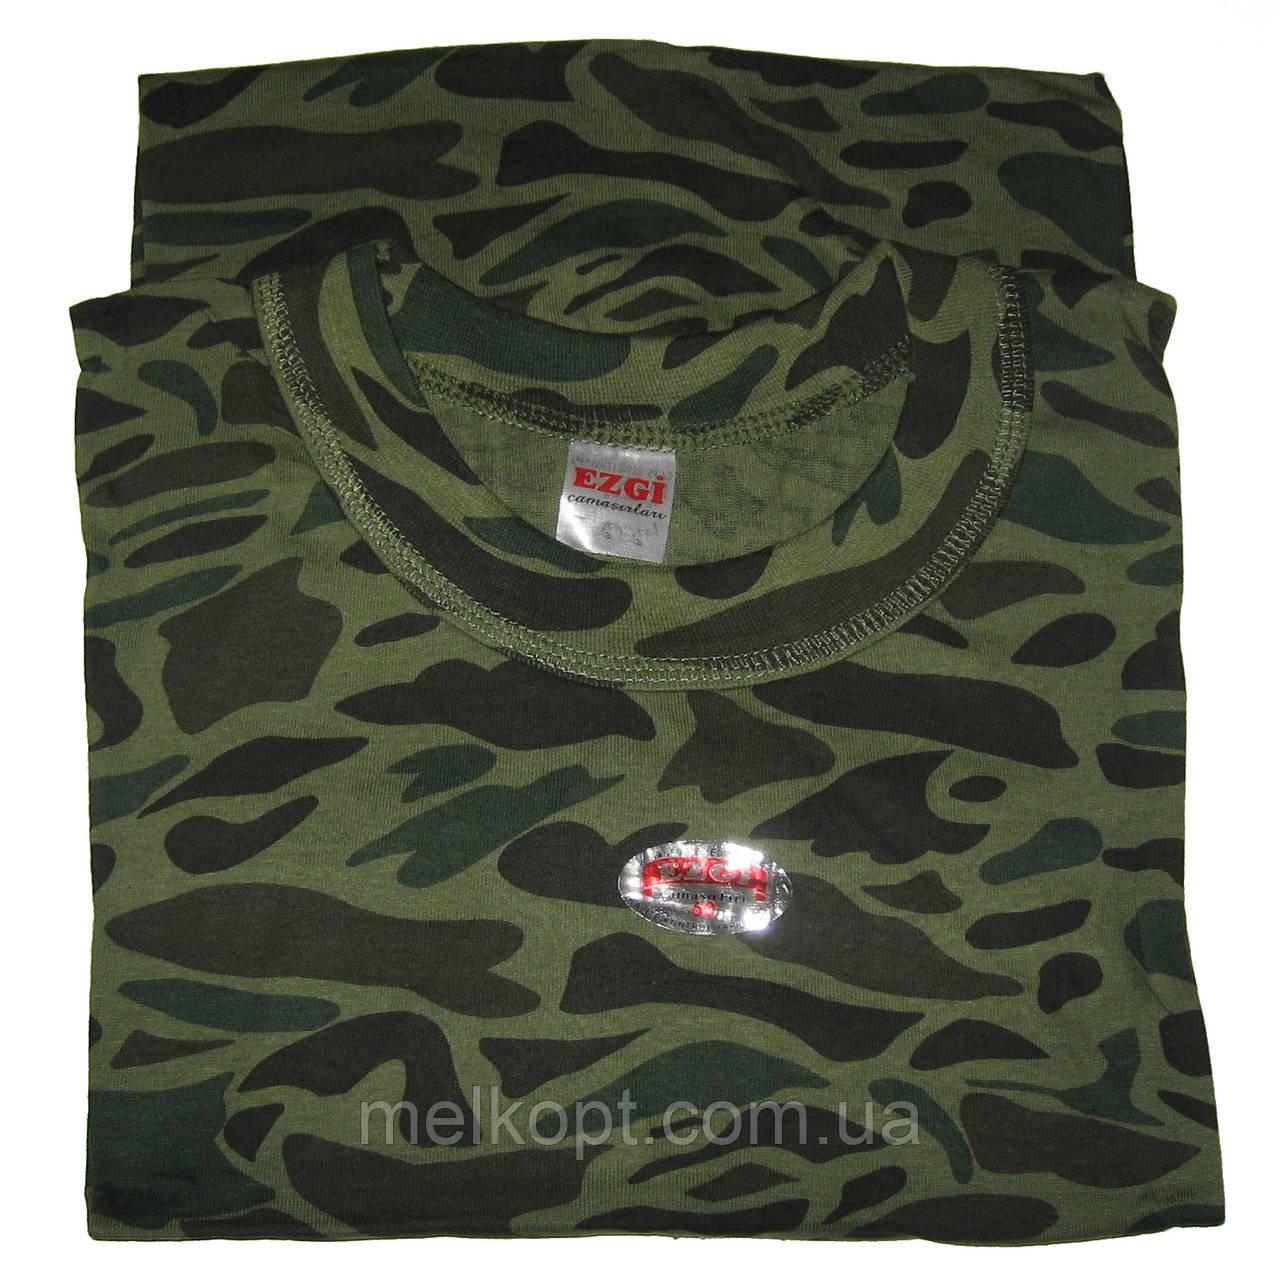 Мужские футболки Ezgi - 78,00 грн./шт. (80-й размер, хаки)